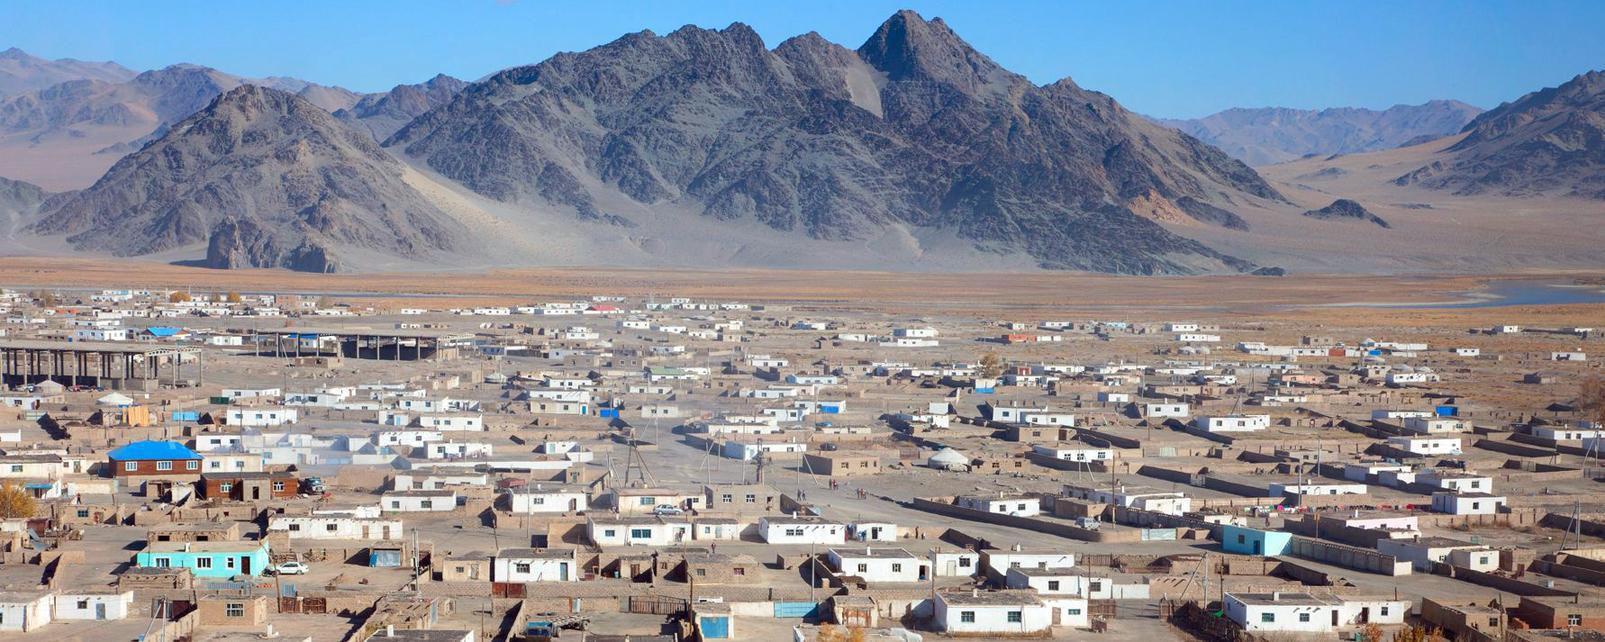 Asie; Mongolie; Oulan Bator;